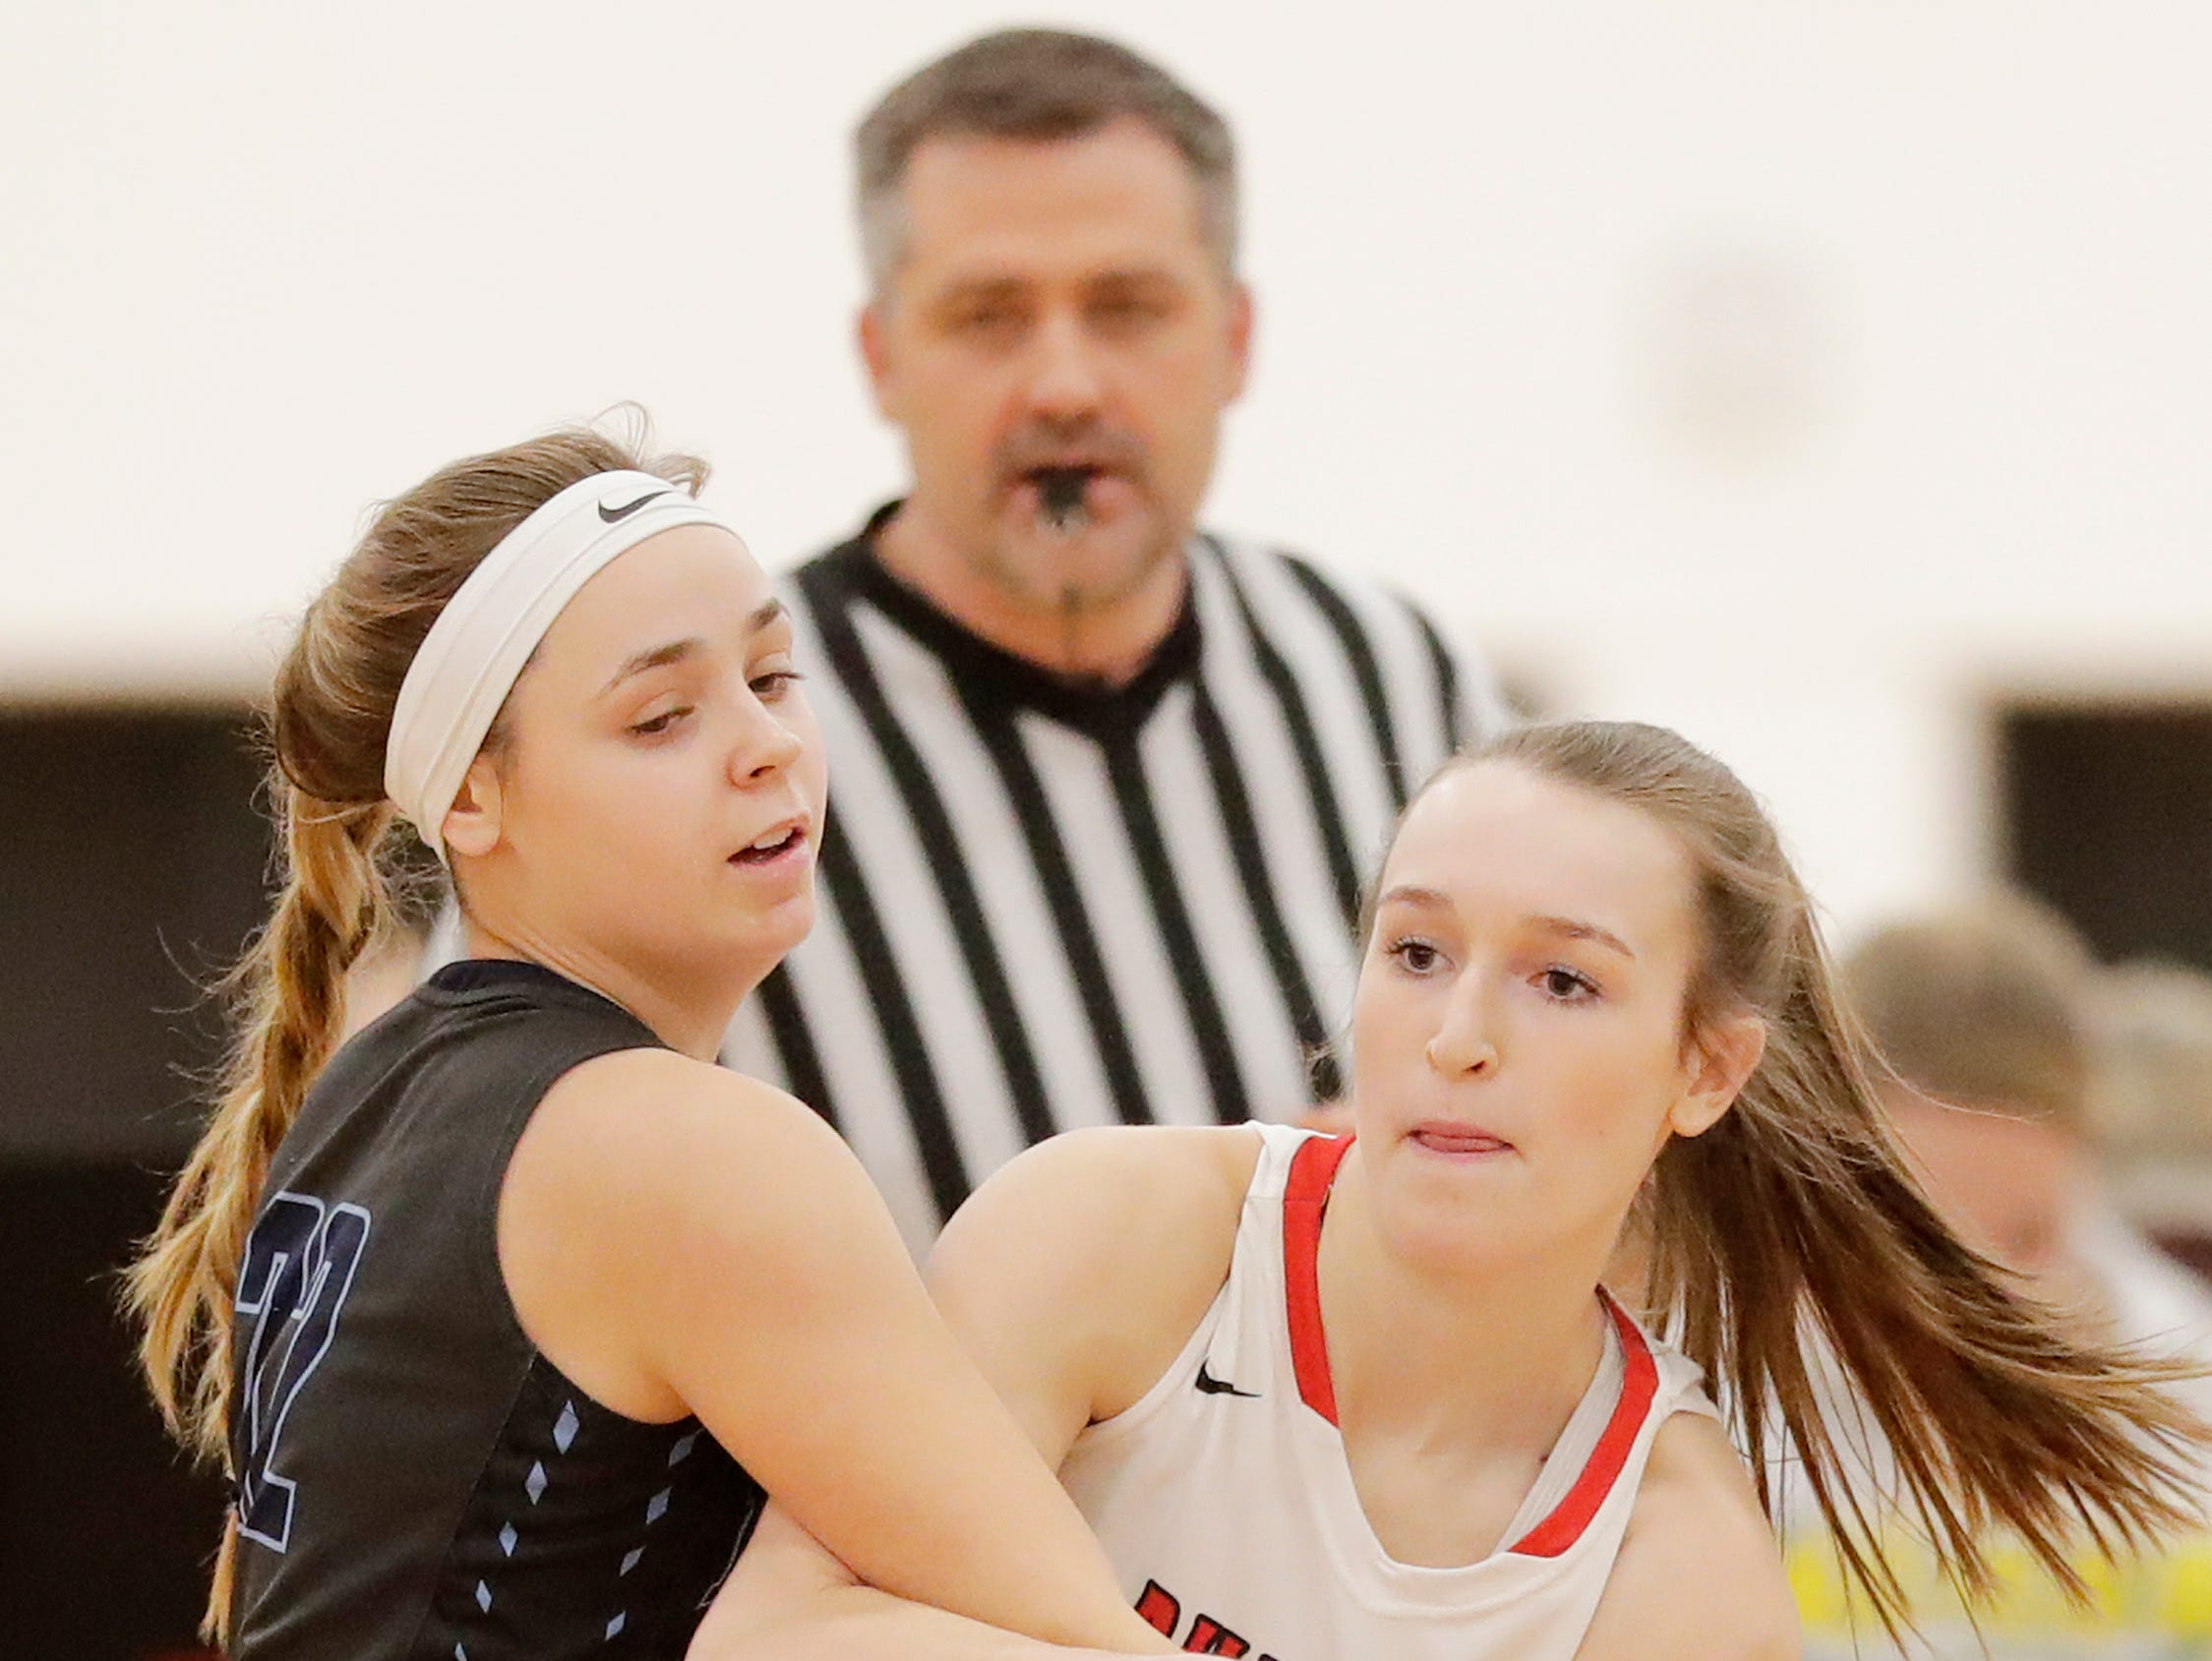 Bay Port's McKenzie Johnson (22) guards Pulaski's Paige Steinbrecher (43) in a girls basketball game at Pulaski high school on Friday, January 4, 2019 in Pulaski, Wis.